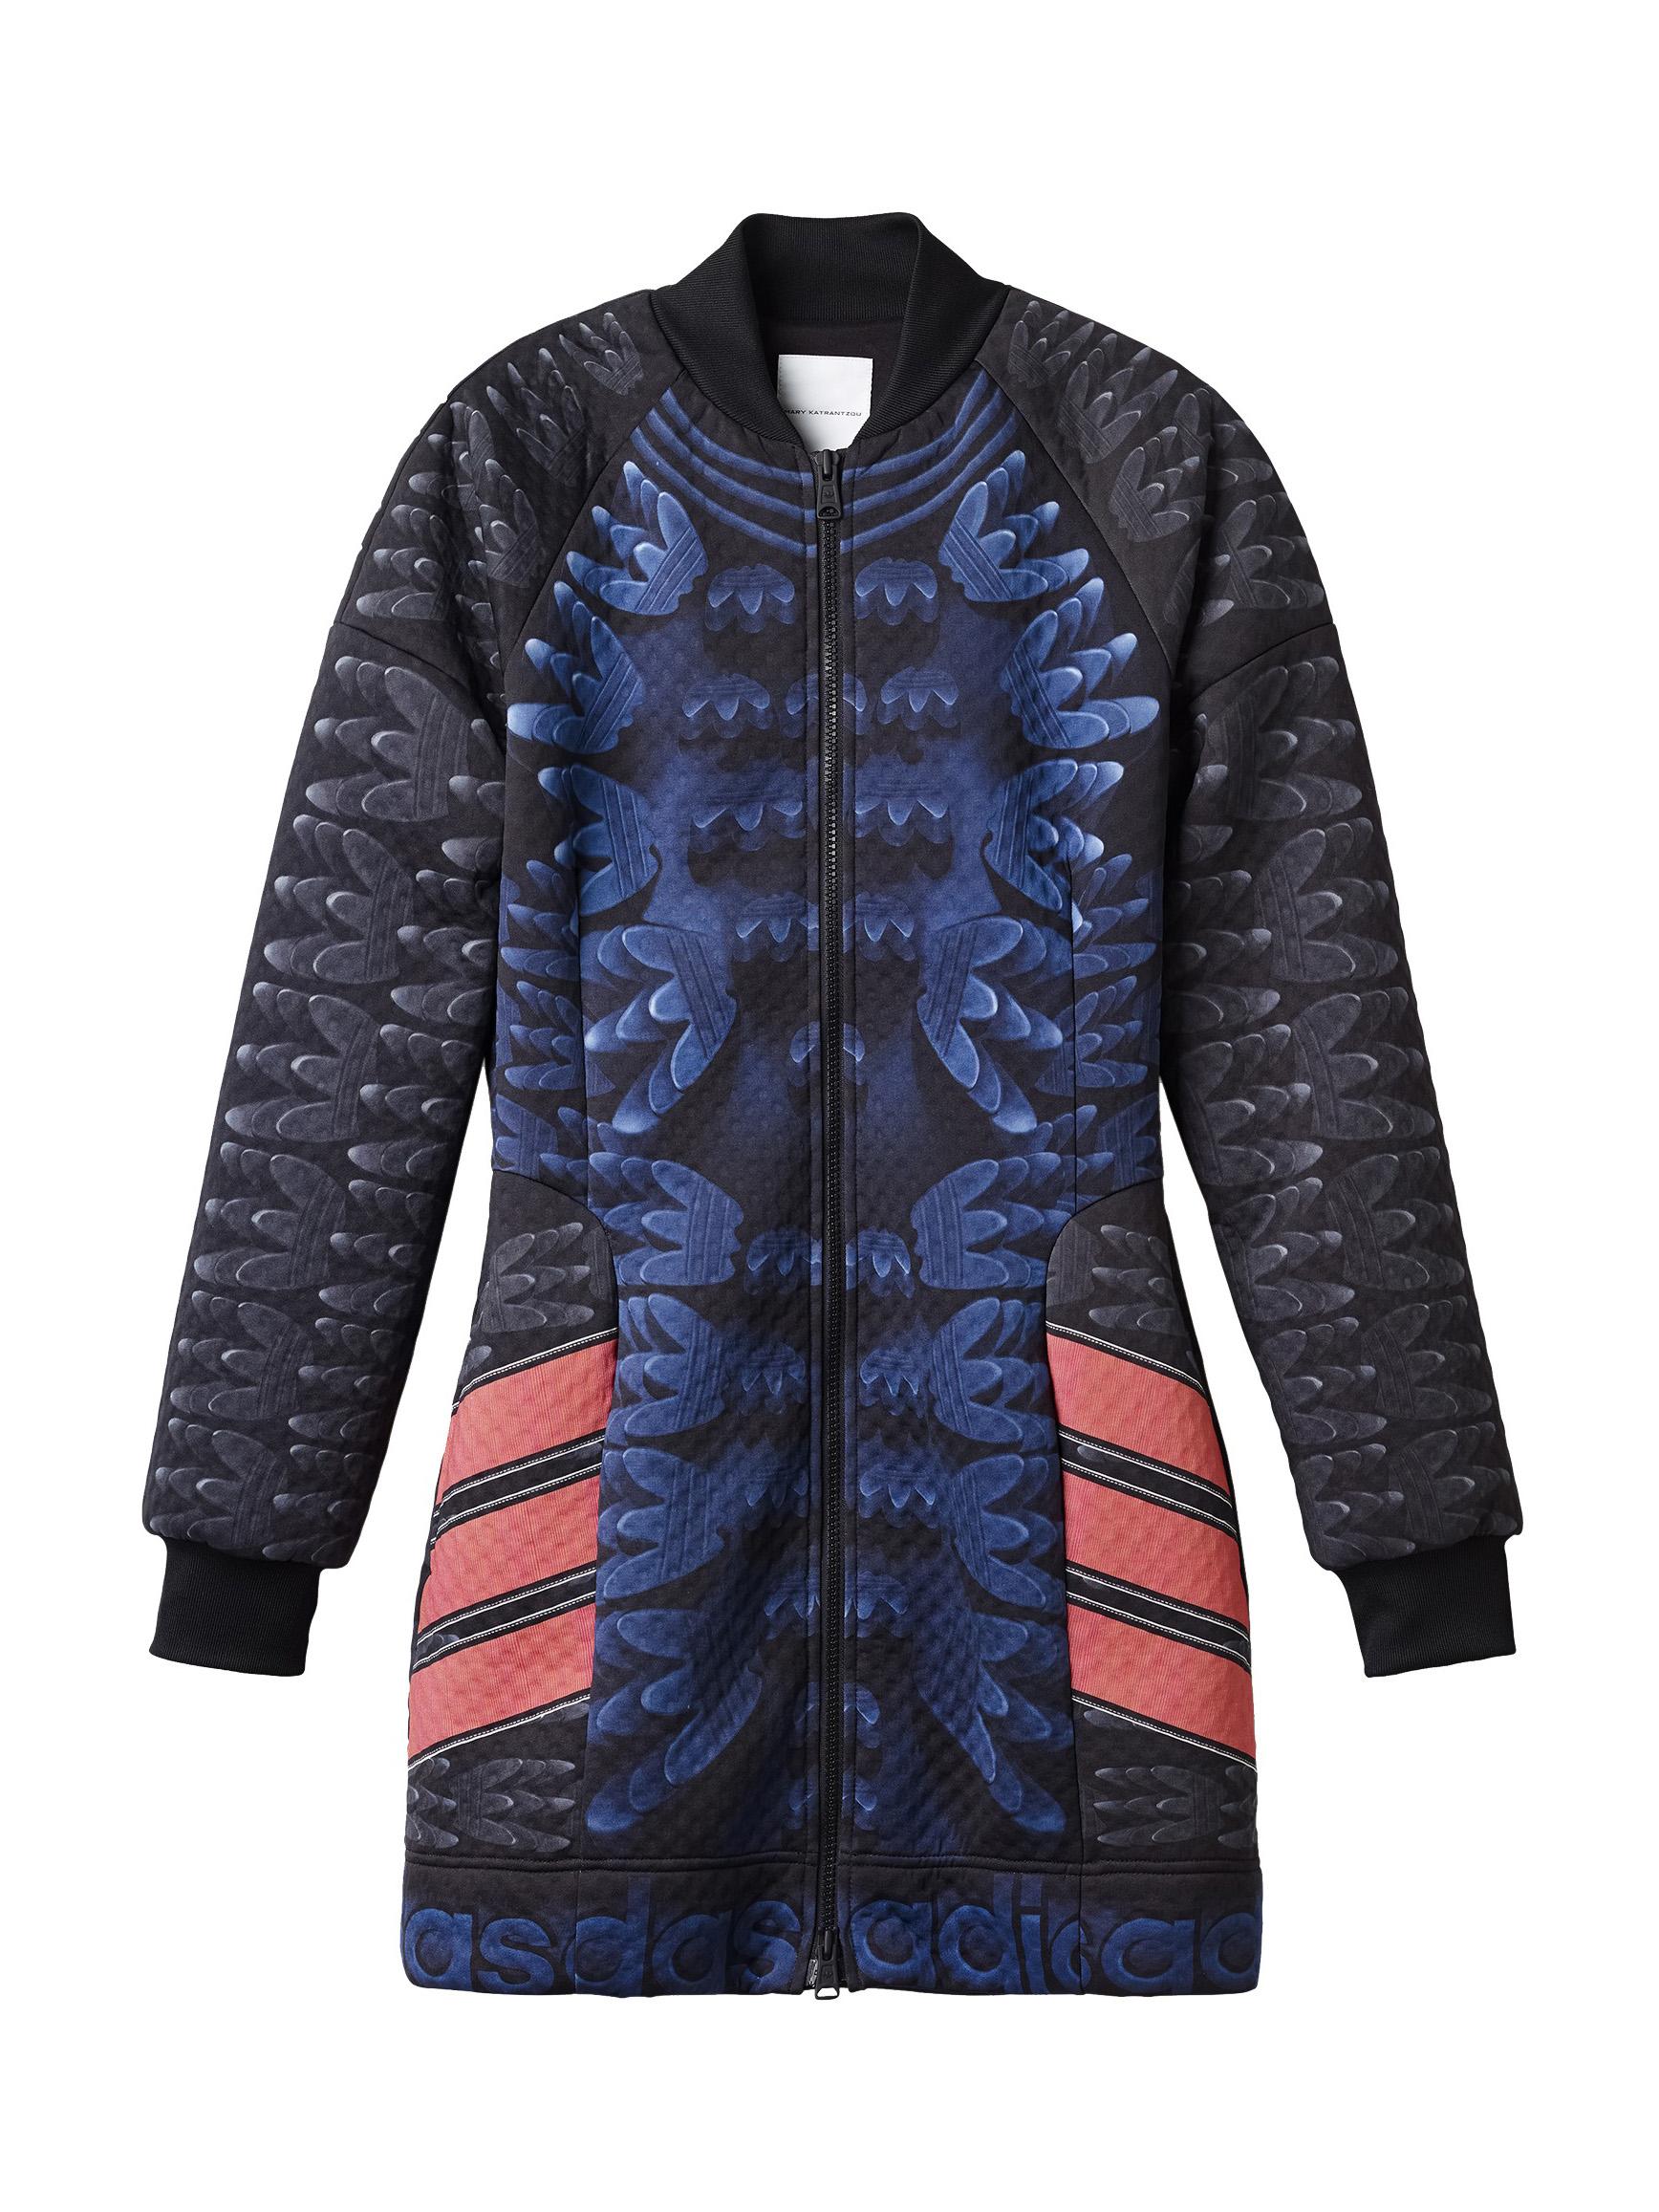 Mary Katrantzou for Adidas on NewKewl/UusTuus